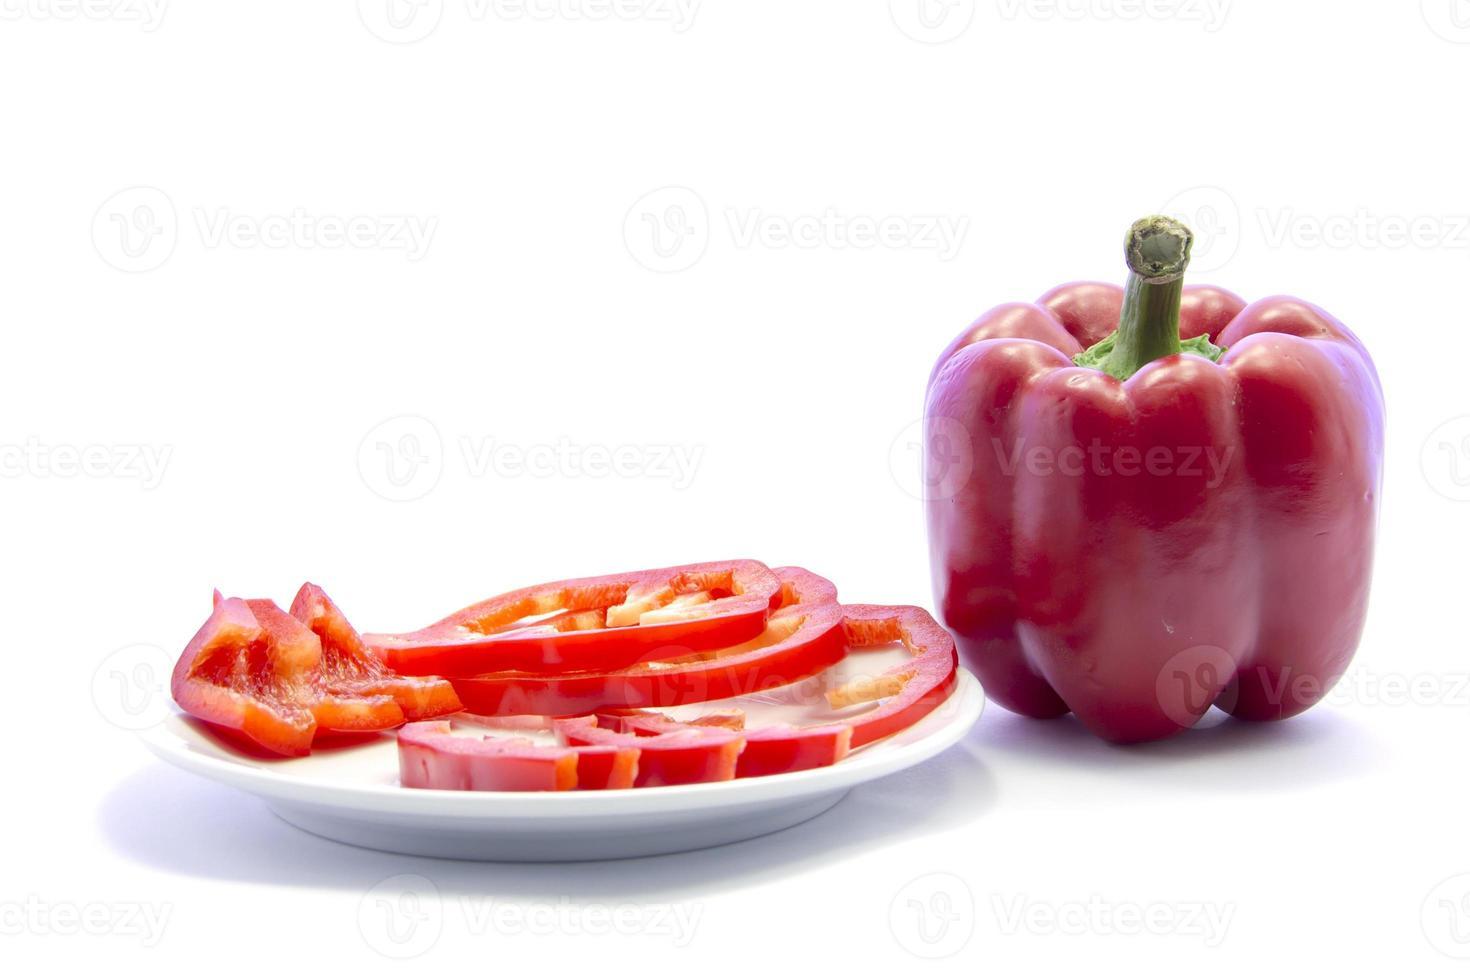 röd klocka chili olika skivad matlagning ingrediens med rå mate foto